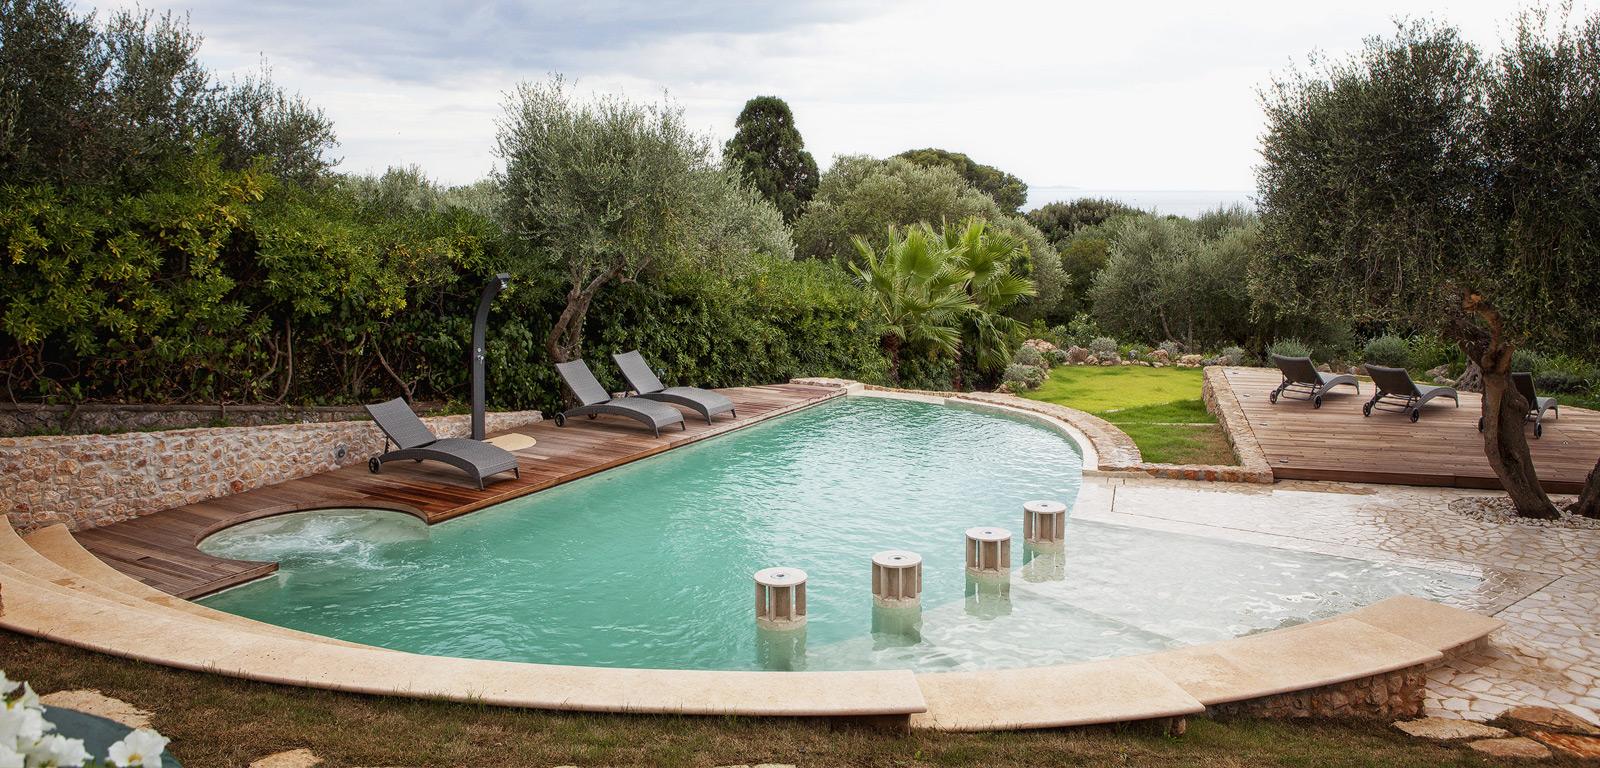 Piscine luxury la piscina esclusiva di lusso piscine for Piscine da giardino design